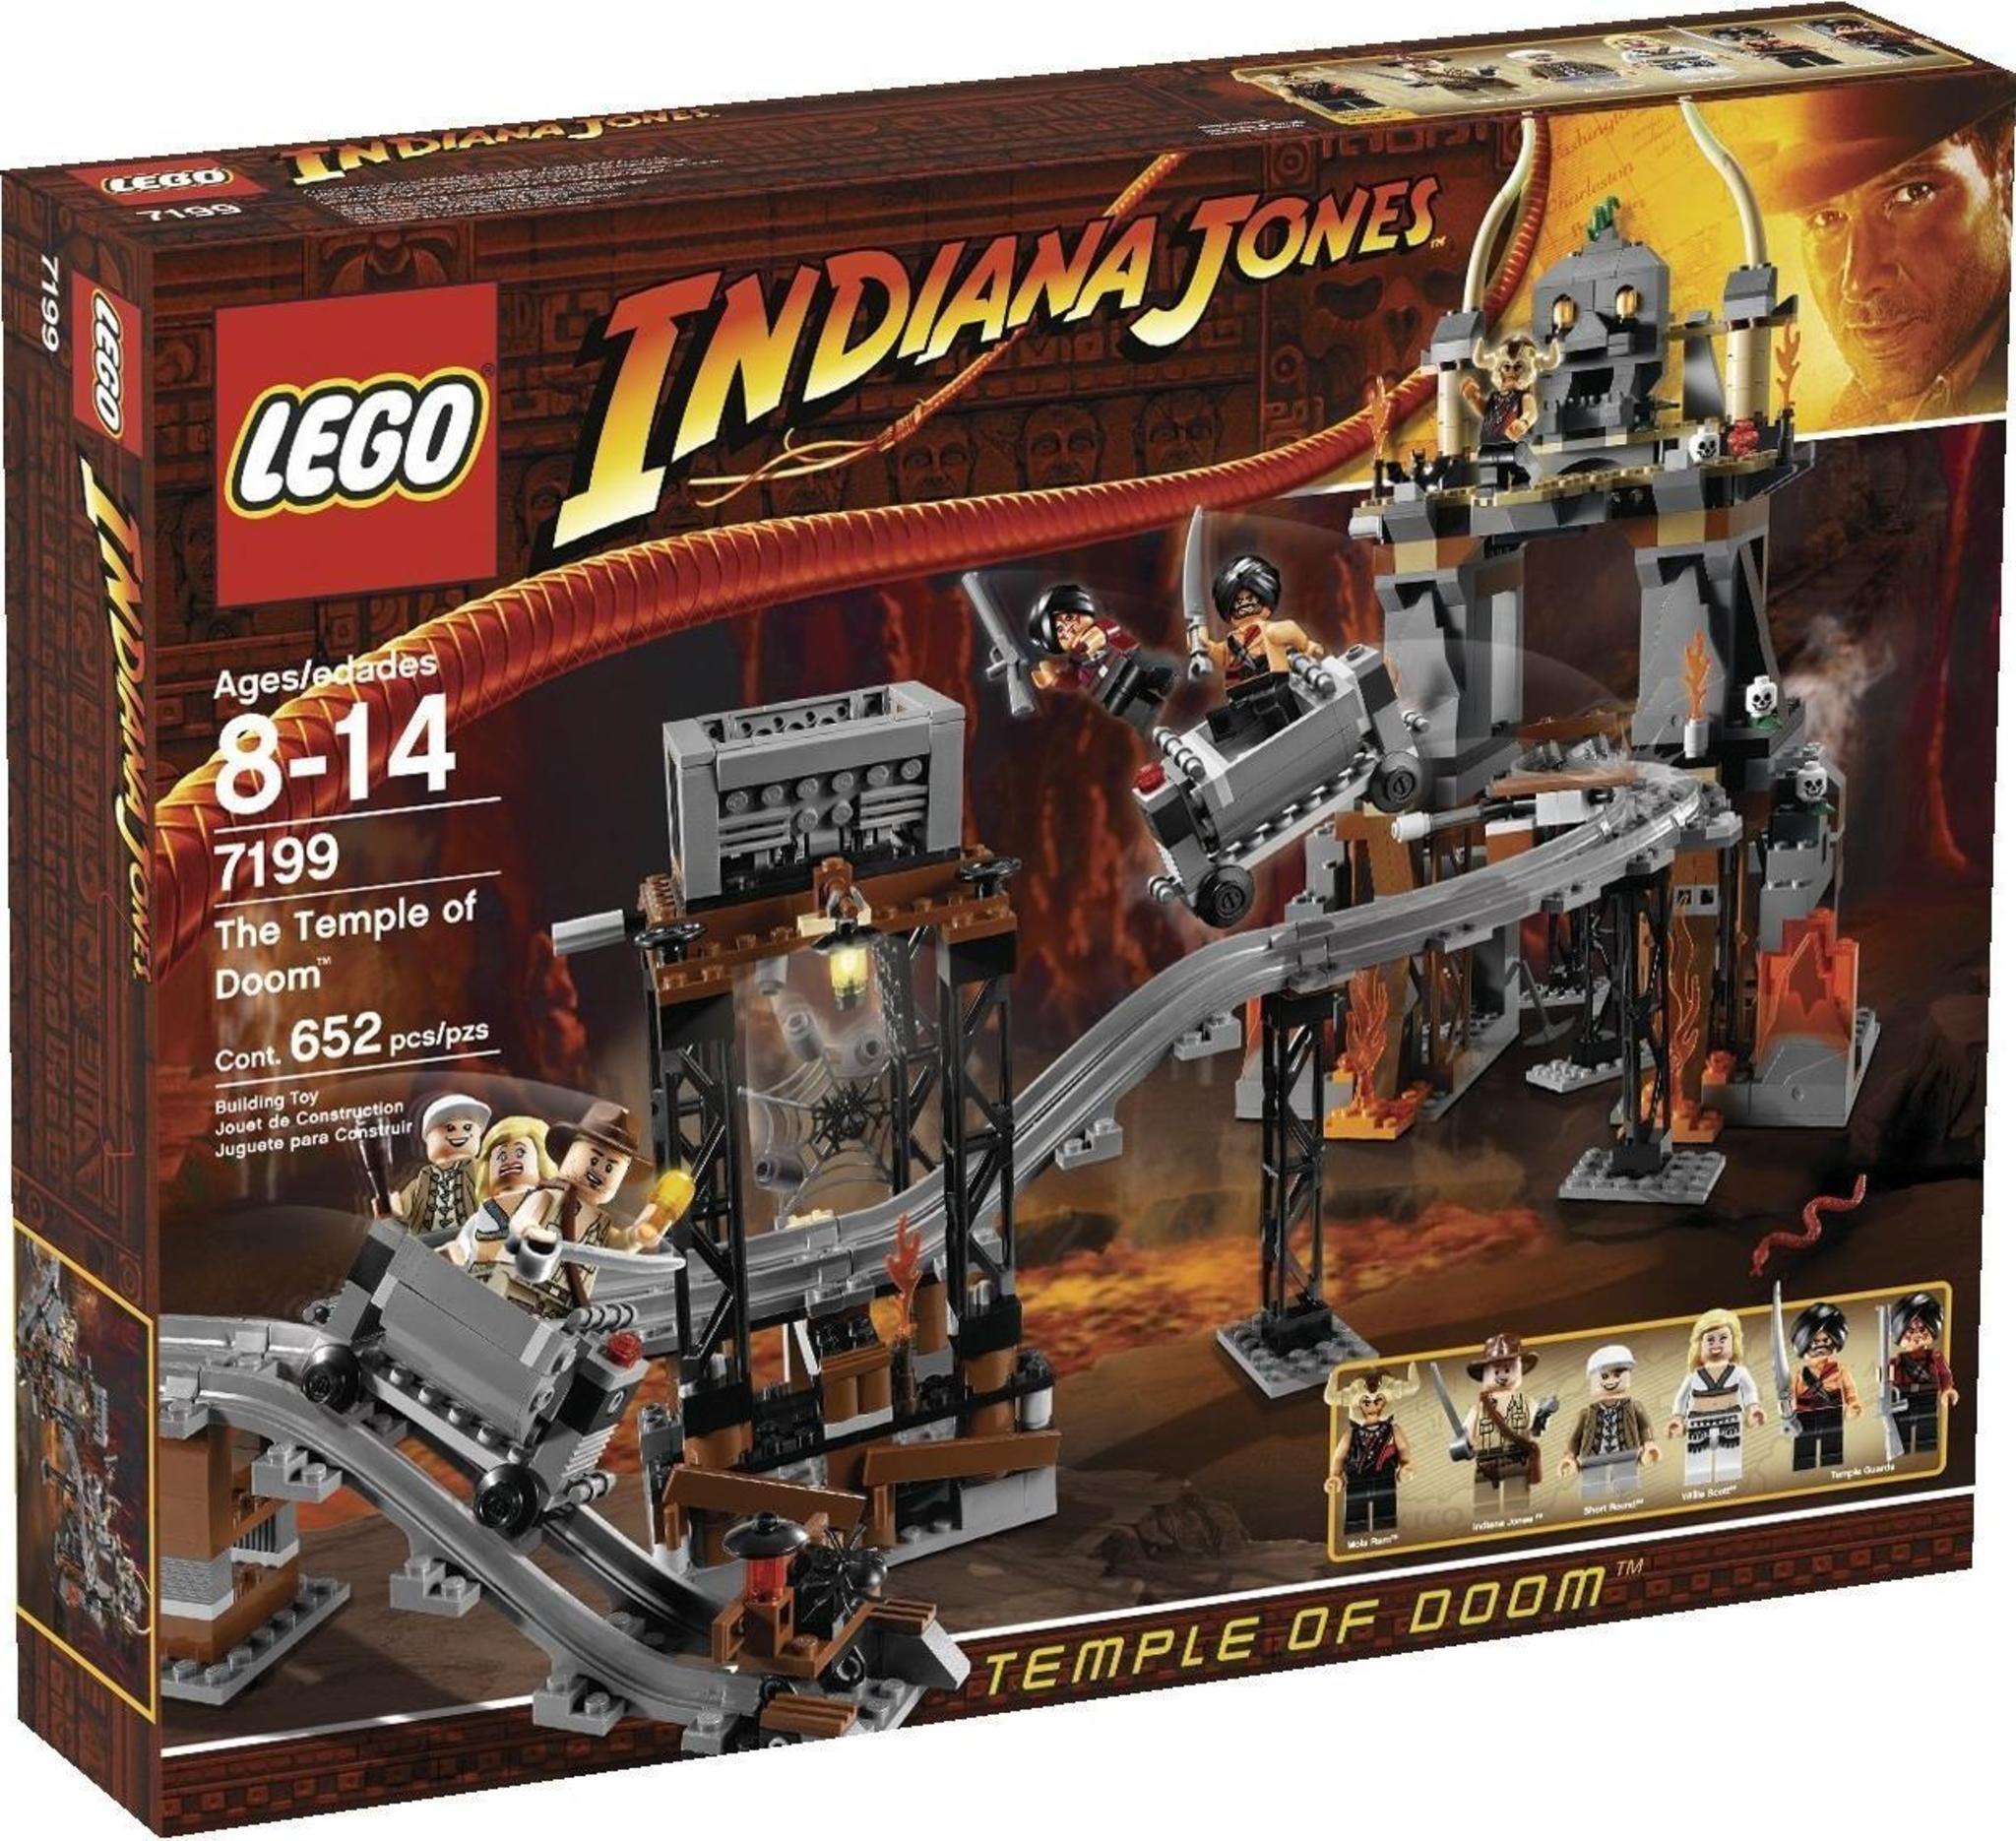 The Jones Of 7199 Doommattonito Indiana Temple Y6gvbfiy7 Lego dxsQthrBoC